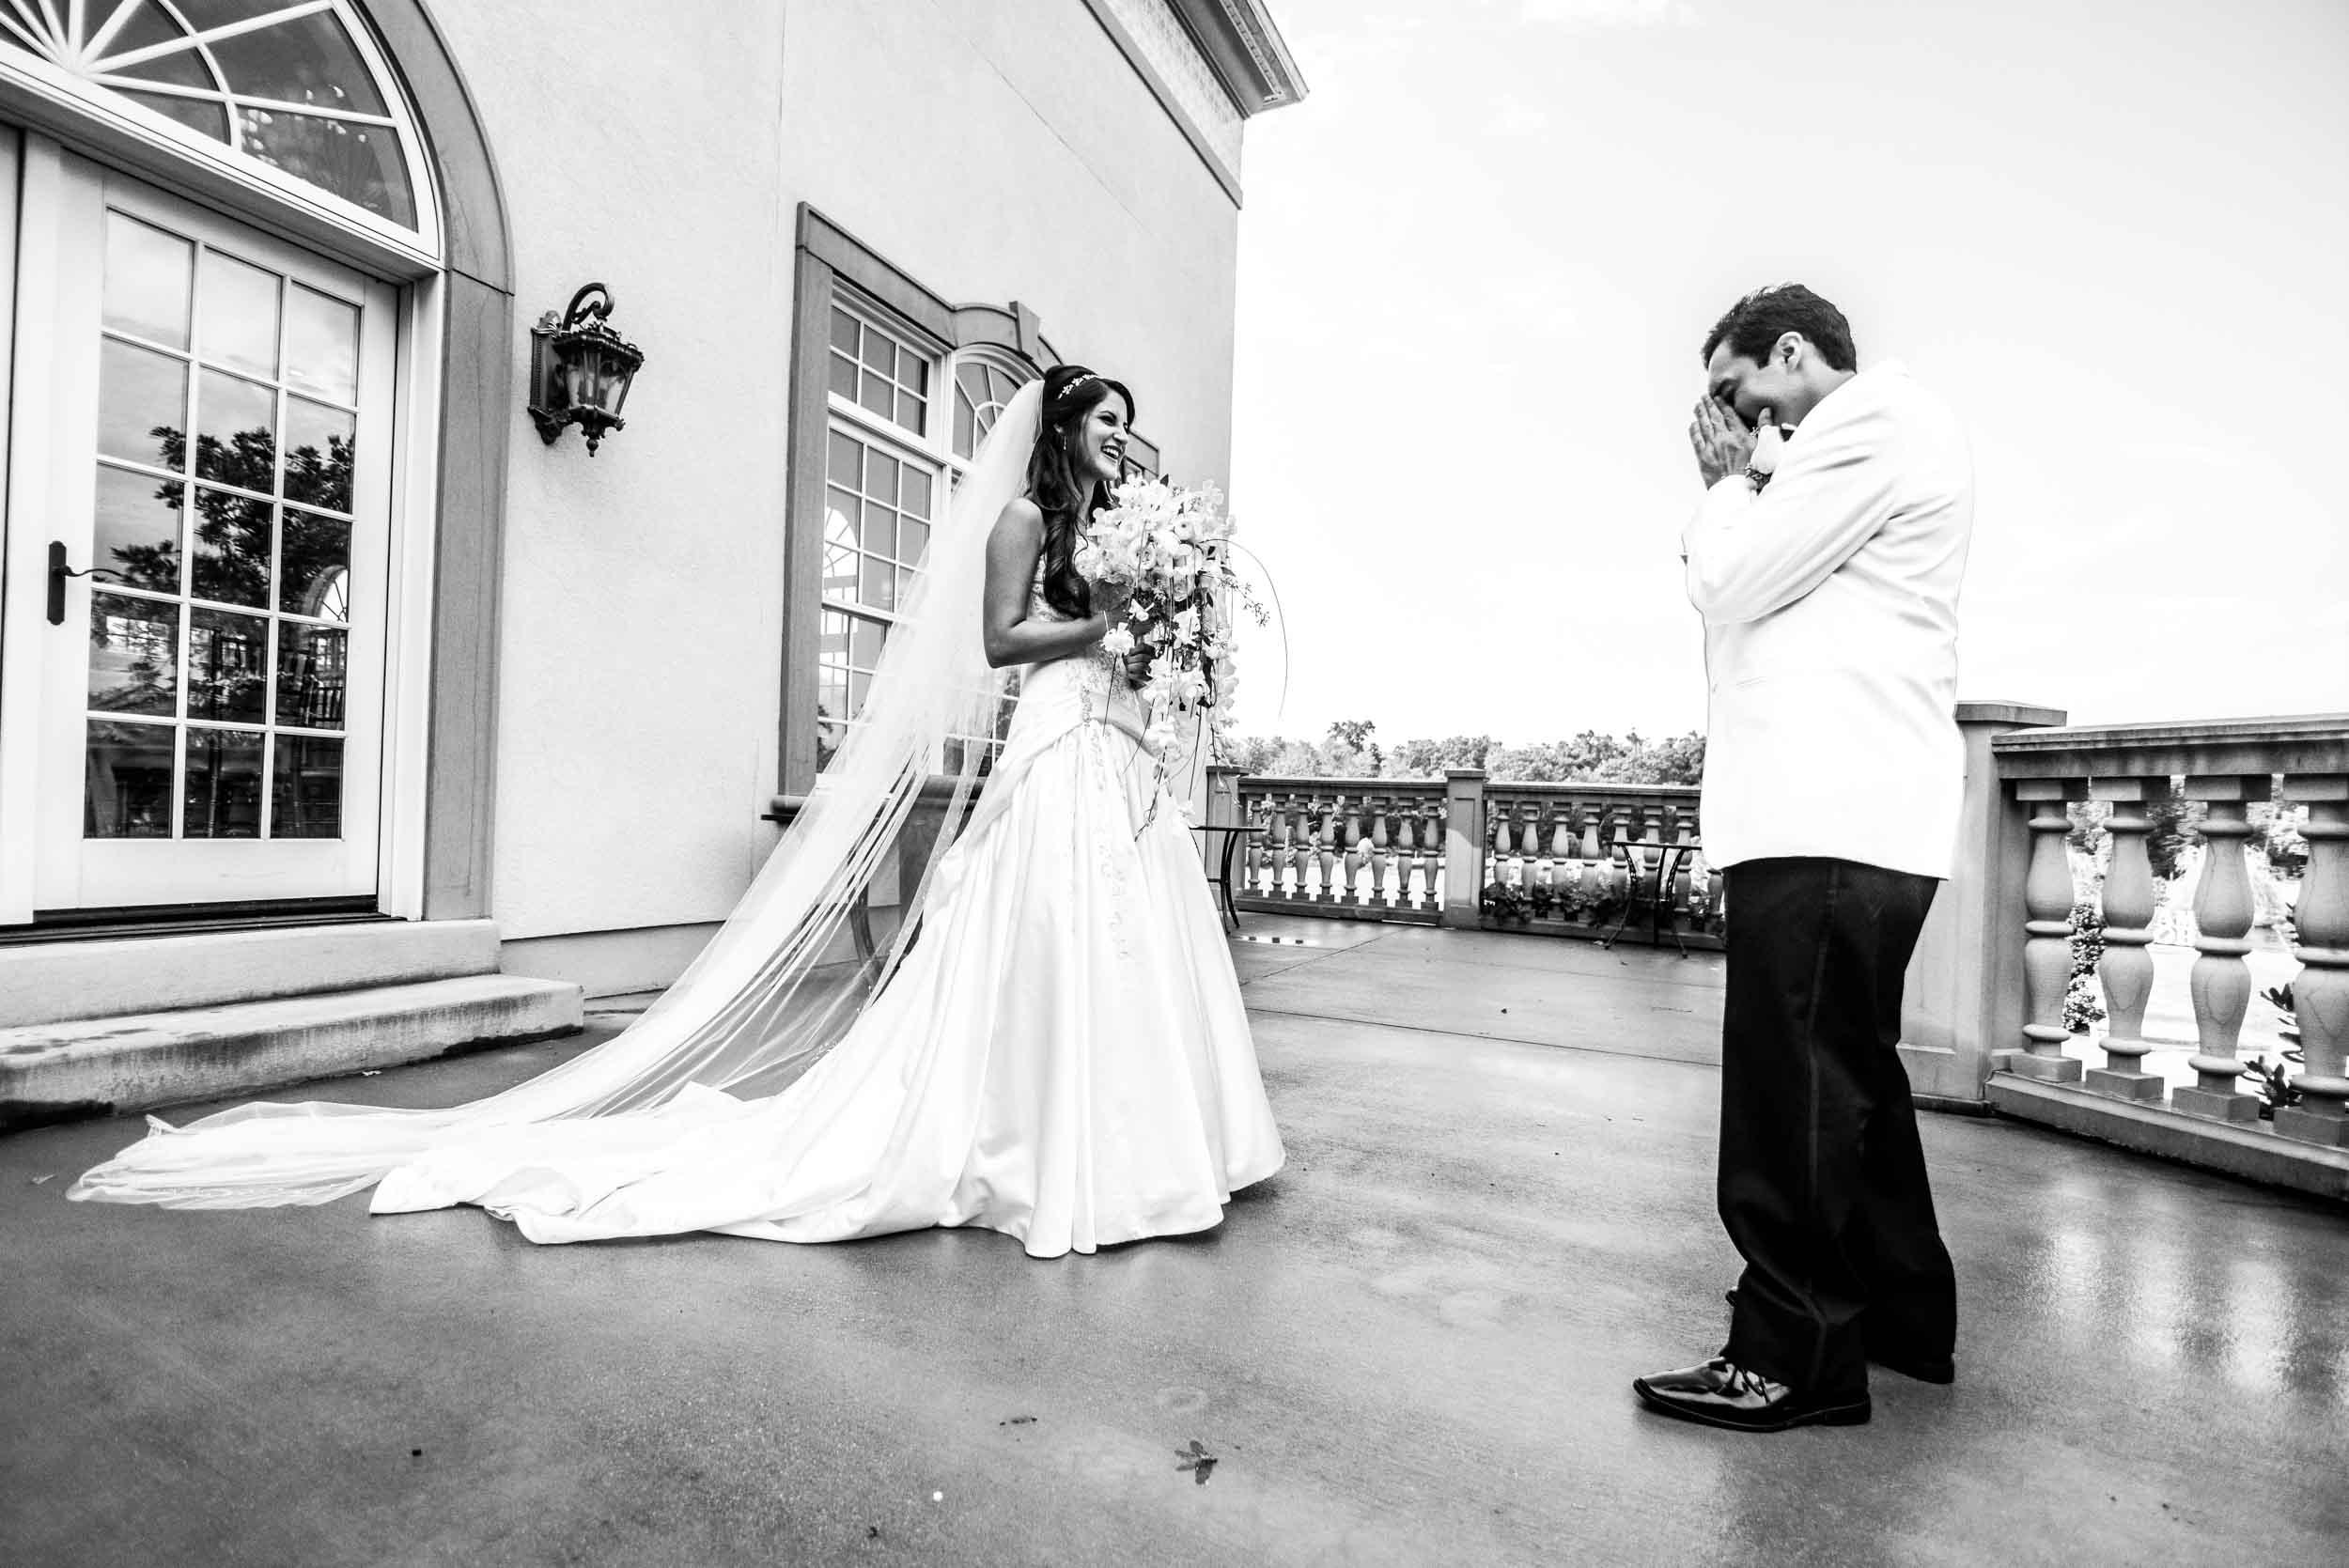 dc+metro+wedding+photographer+vadym+guliuk+photography+weddings+first-look-2021.jpg